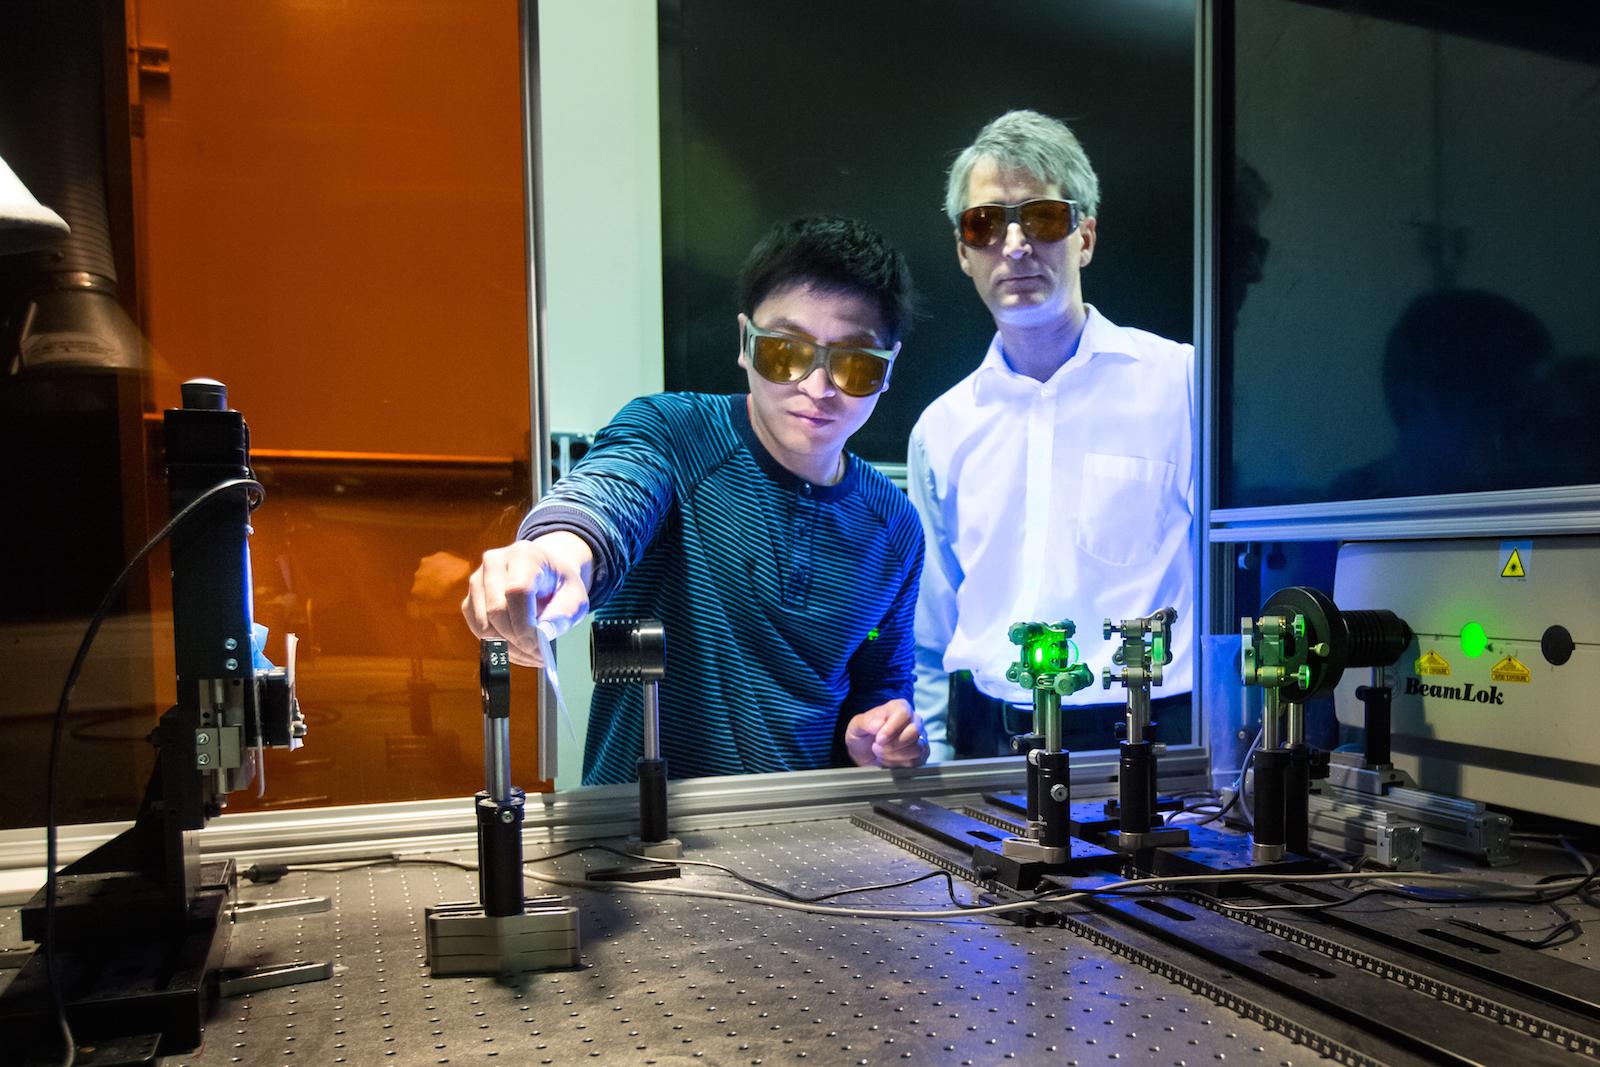 Oak Ridge National Laboratory - Laser Bonding